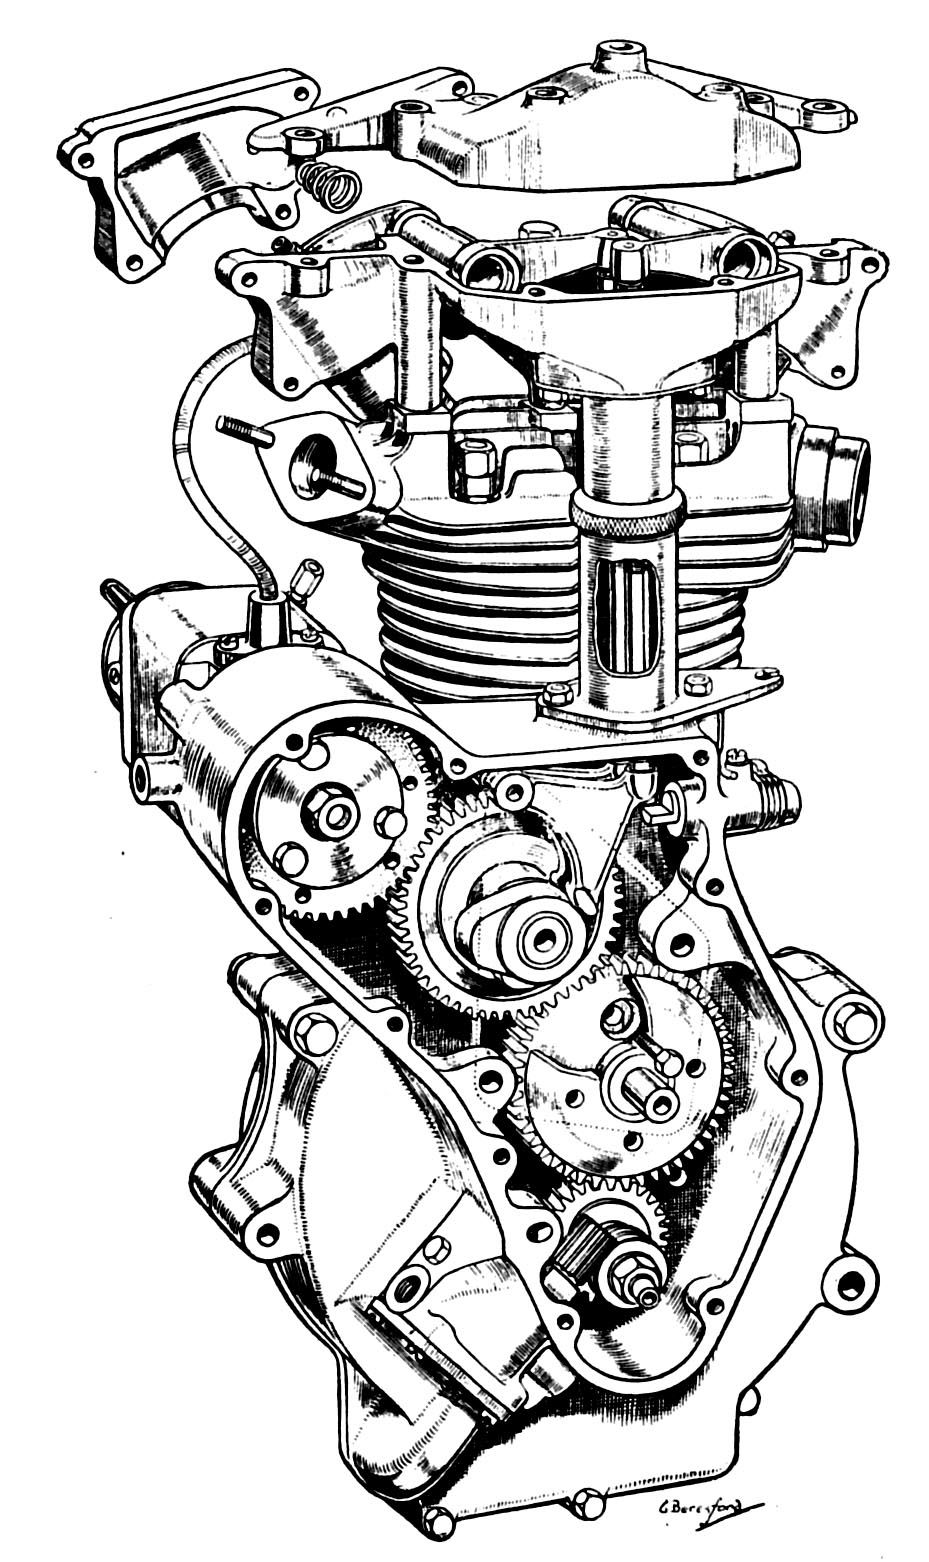 cutaway view of the 1973 kawasaki z1 900 engine description from pinterest com  [ 929 x 1562 Pixel ]